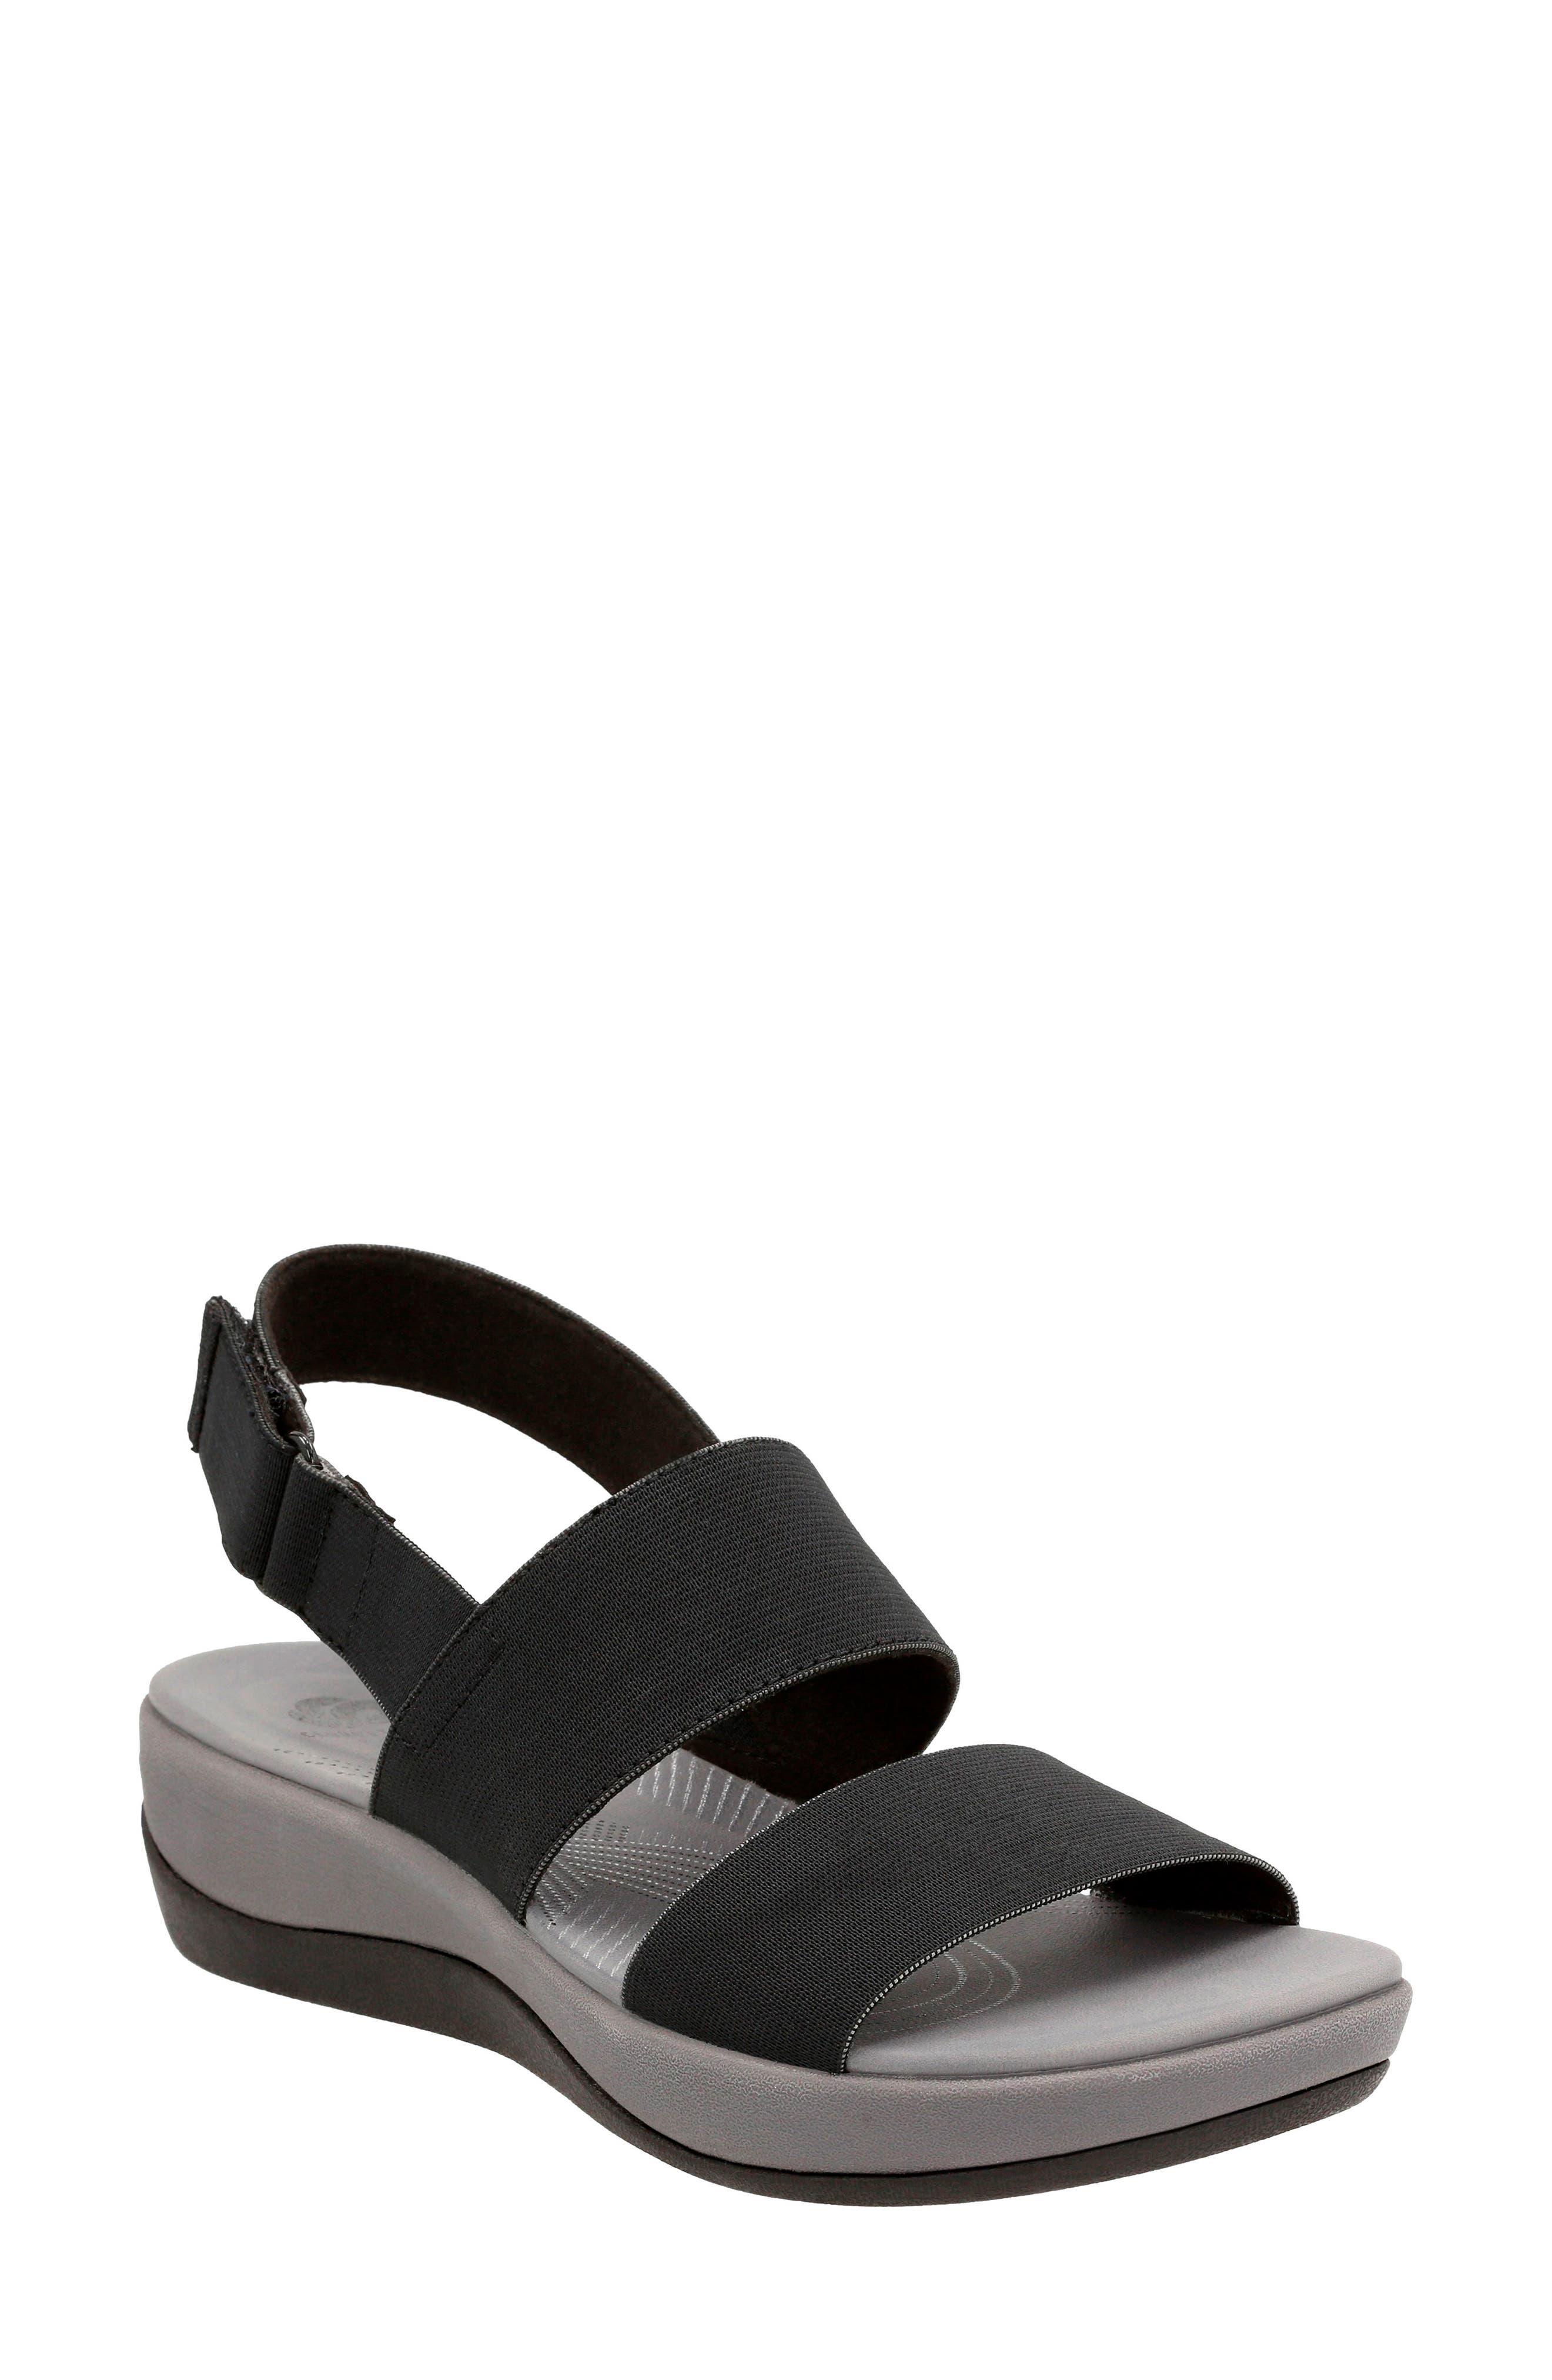 Arla Jacory Sandal,                             Main thumbnail 1, color,                             Black Solid Fabric